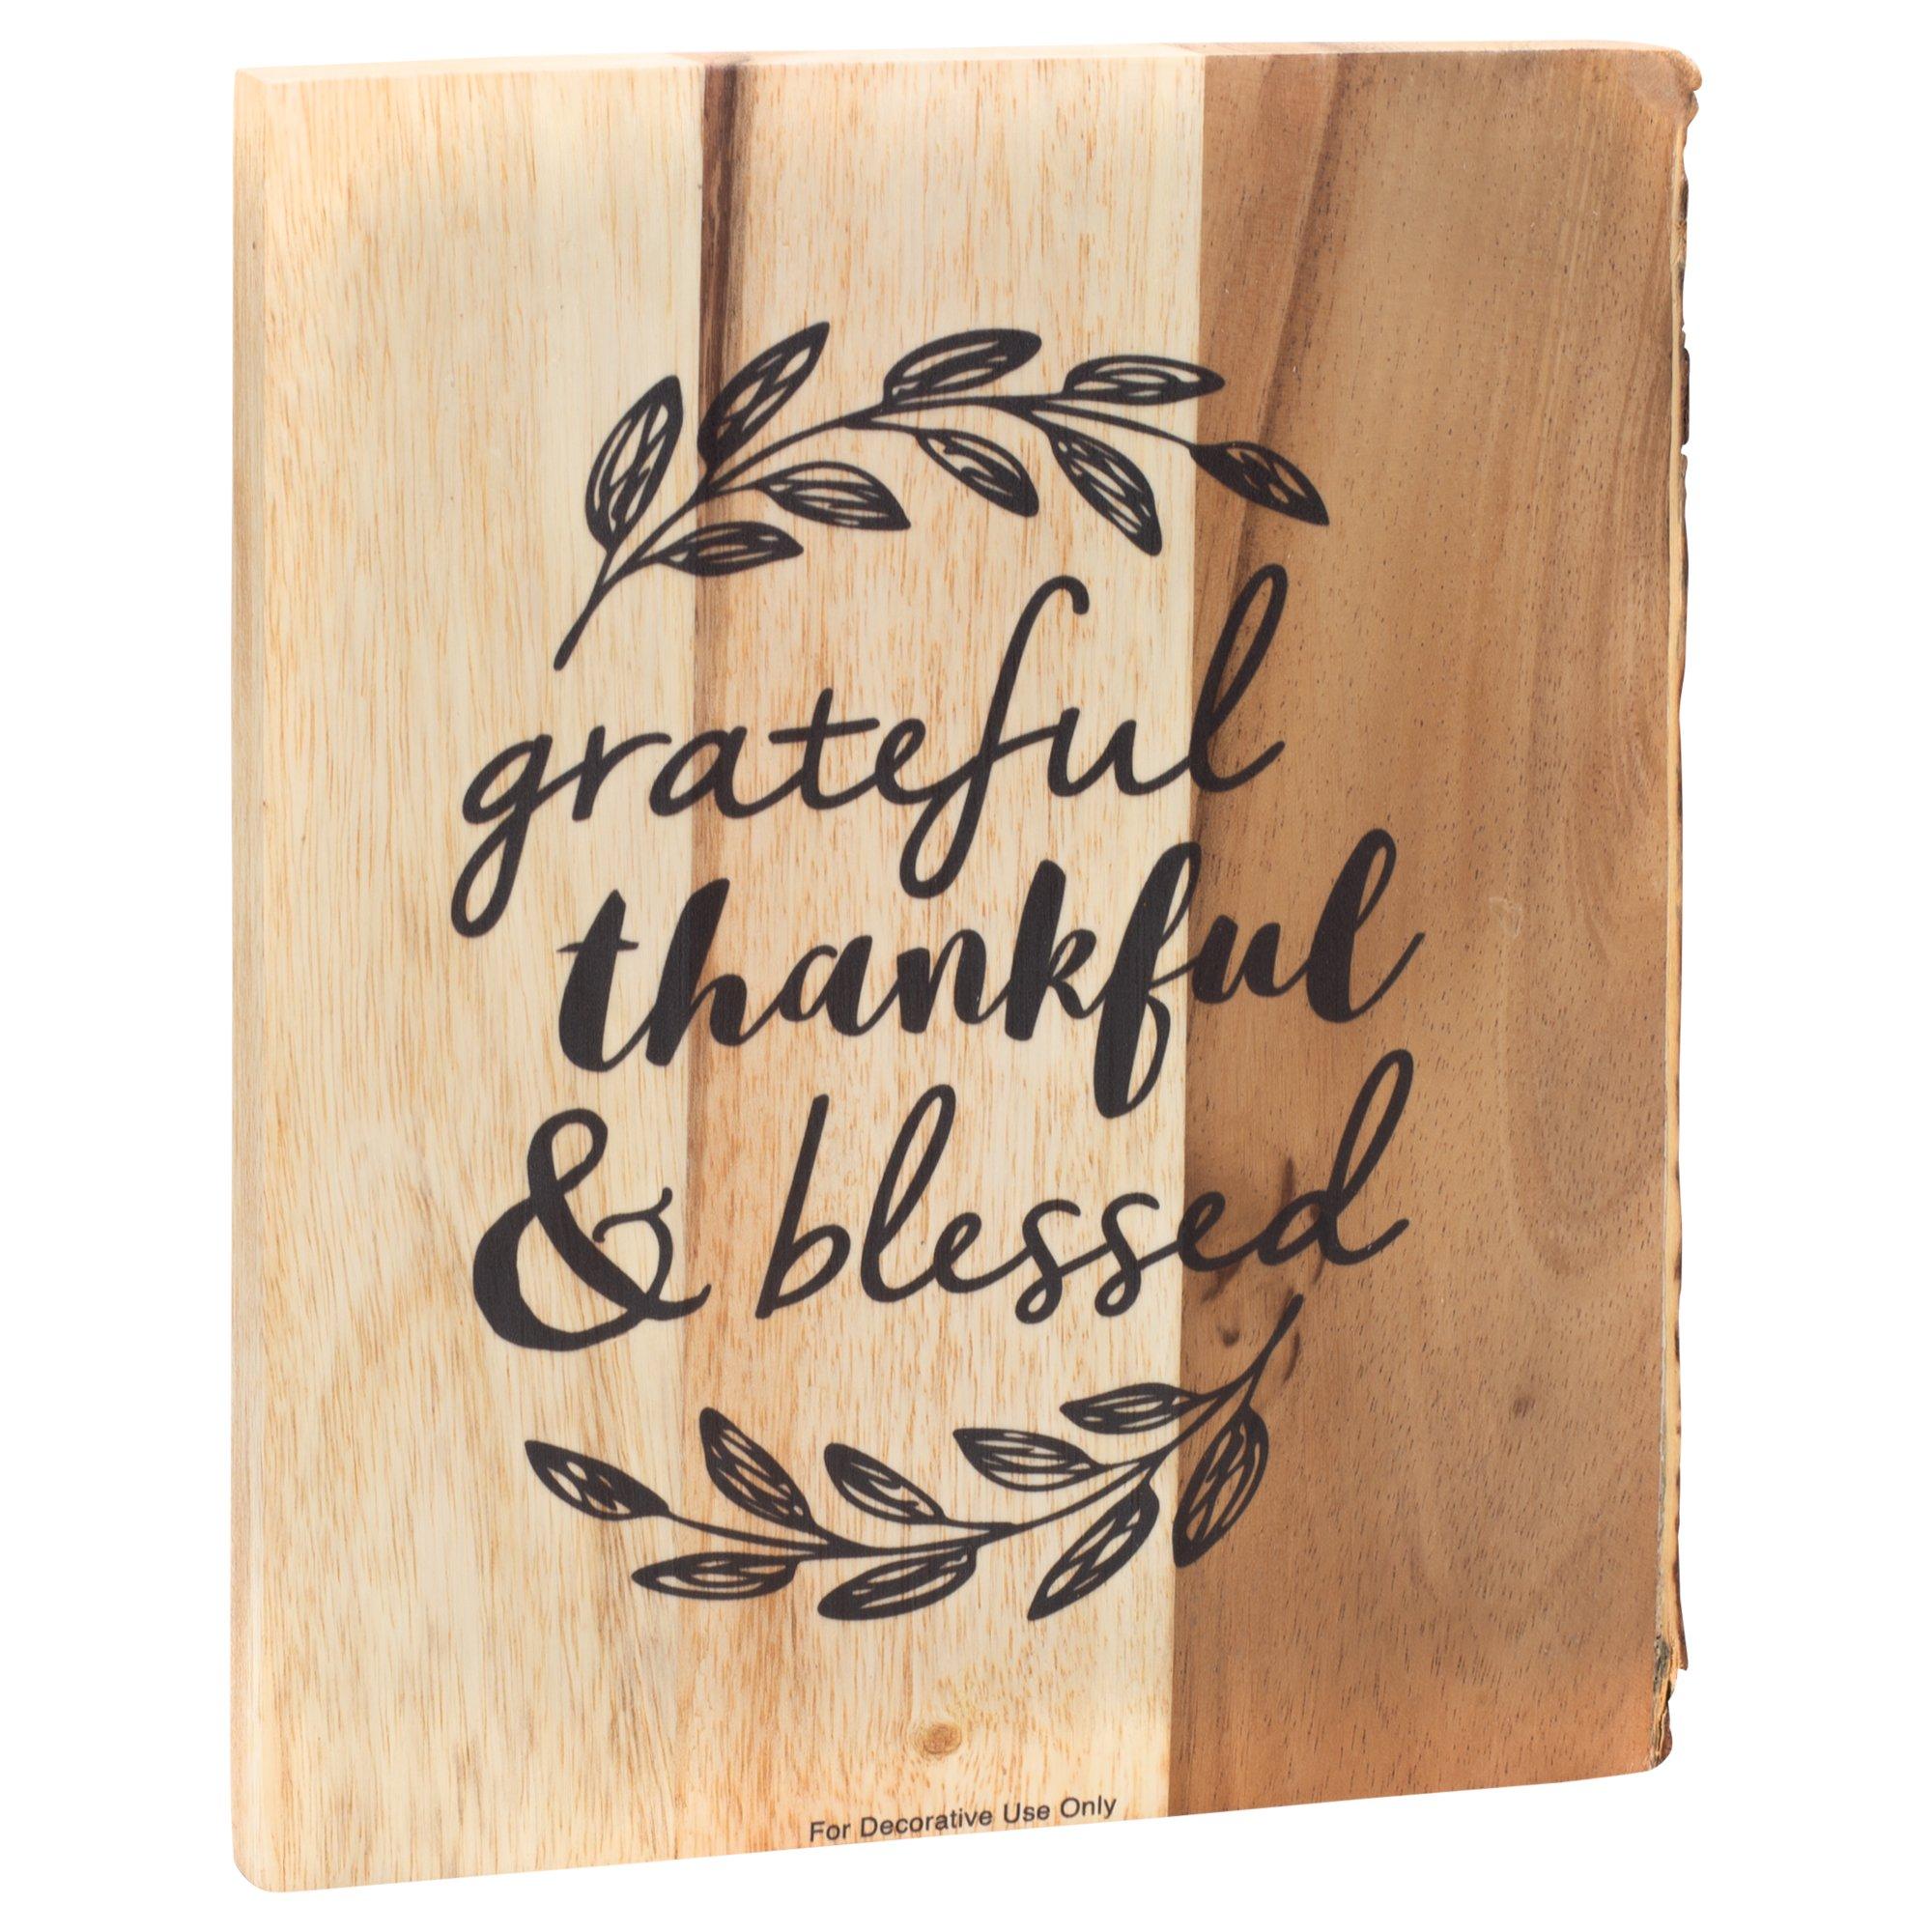 Grateful, Thankful, Blessed Bark Edgeing Acacia Wood Cutting Board